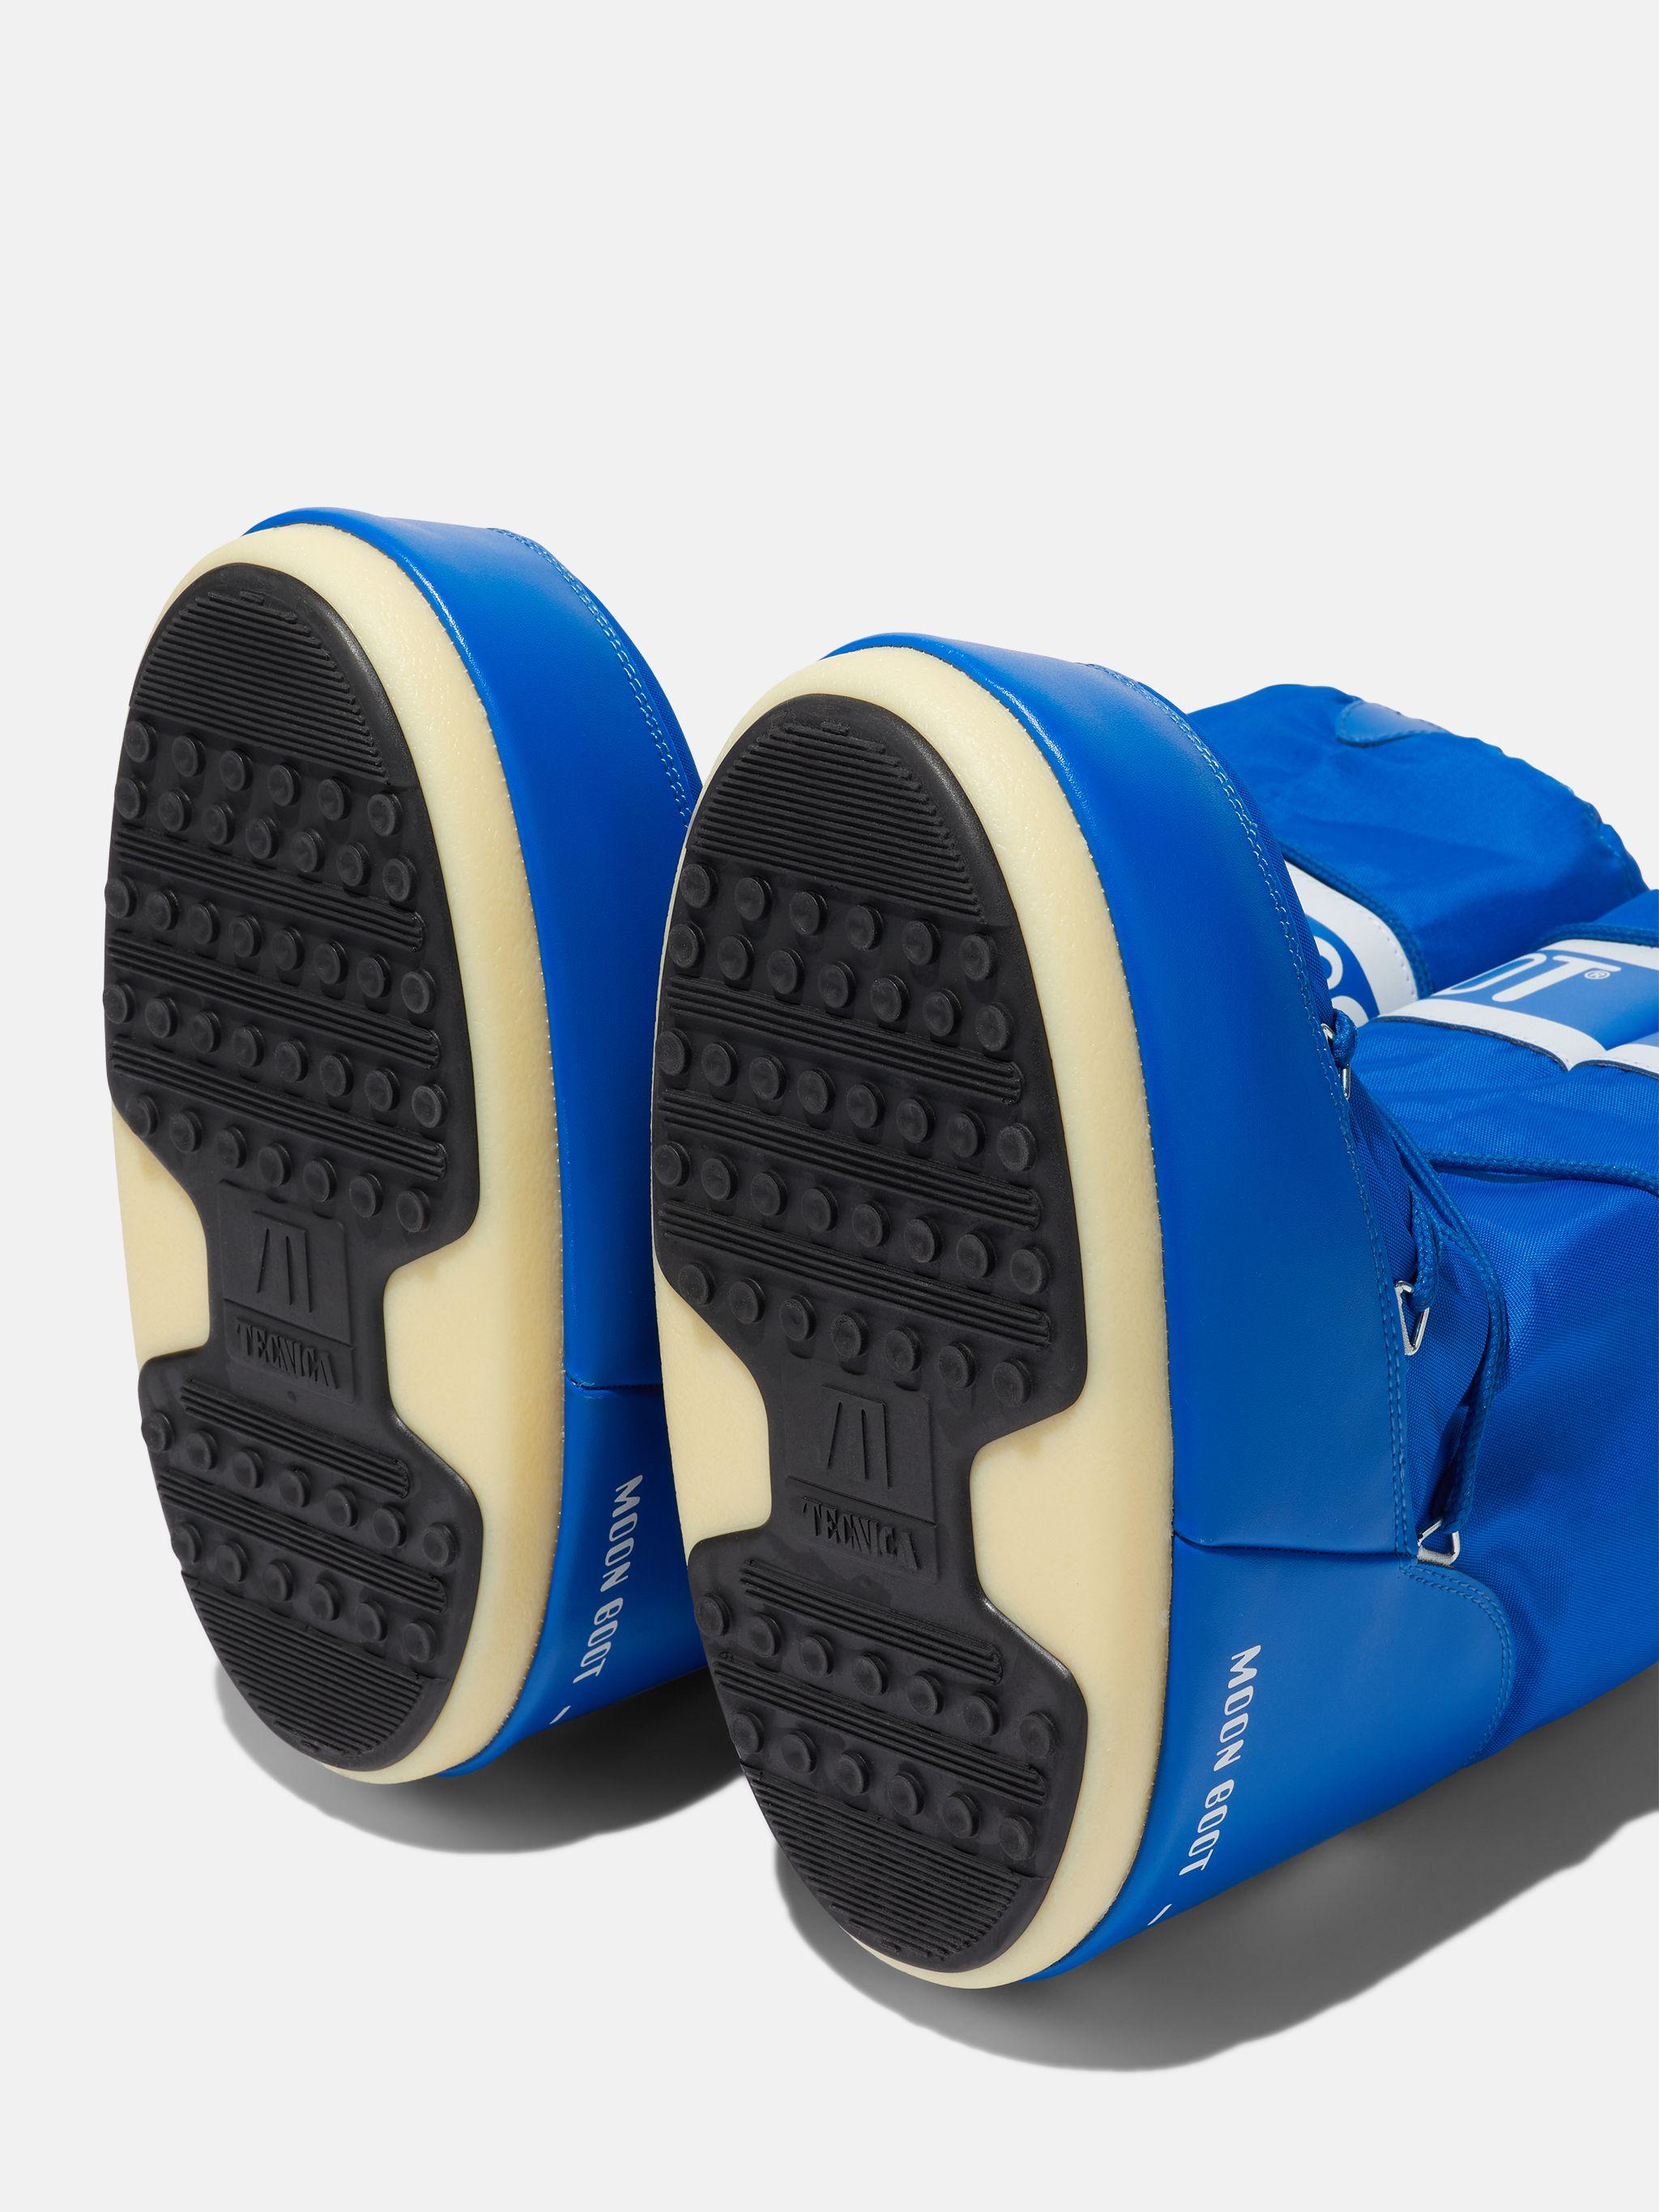 ICON ELECTRIC-BLUE NYLON BOOTS